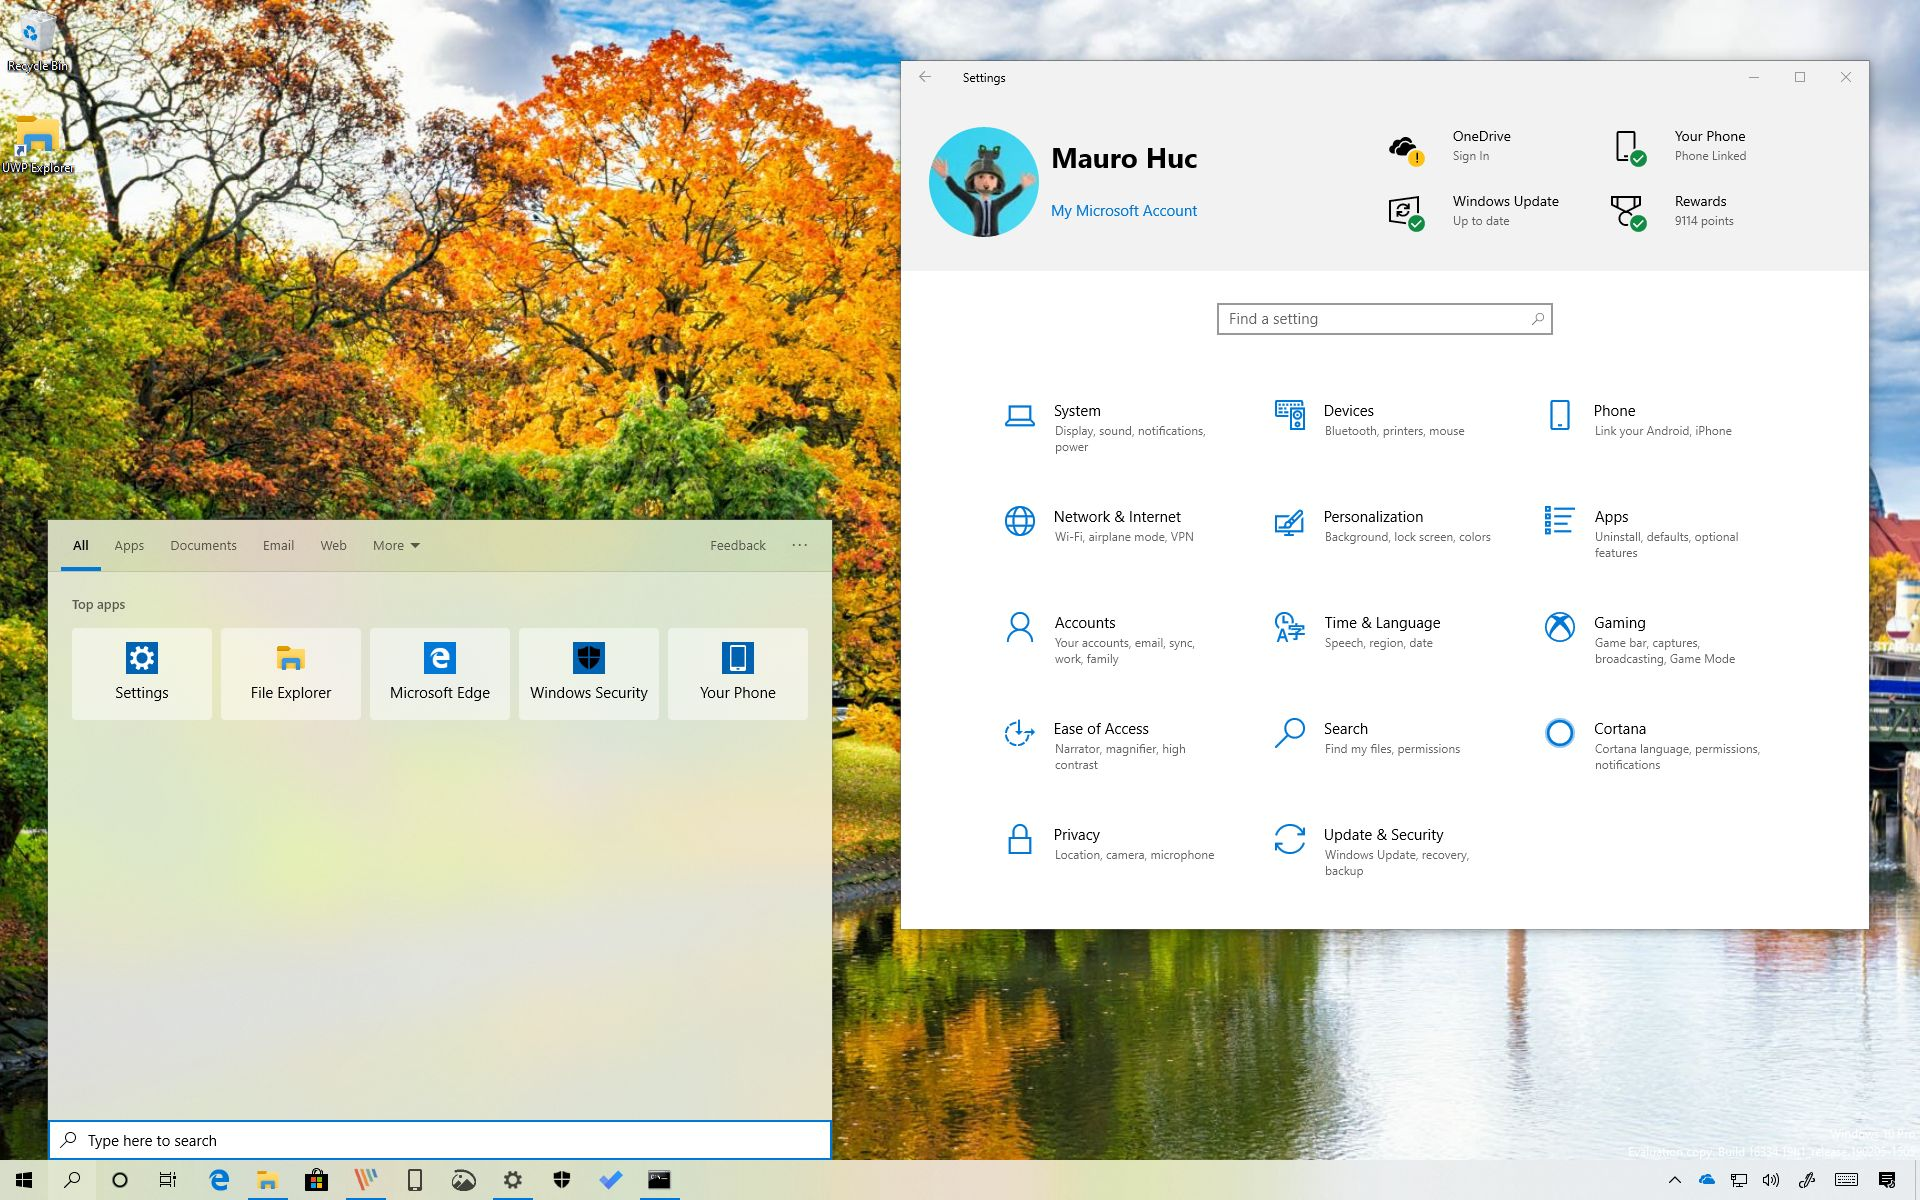 Windows 10 version 1903, April 2019 Update, release date